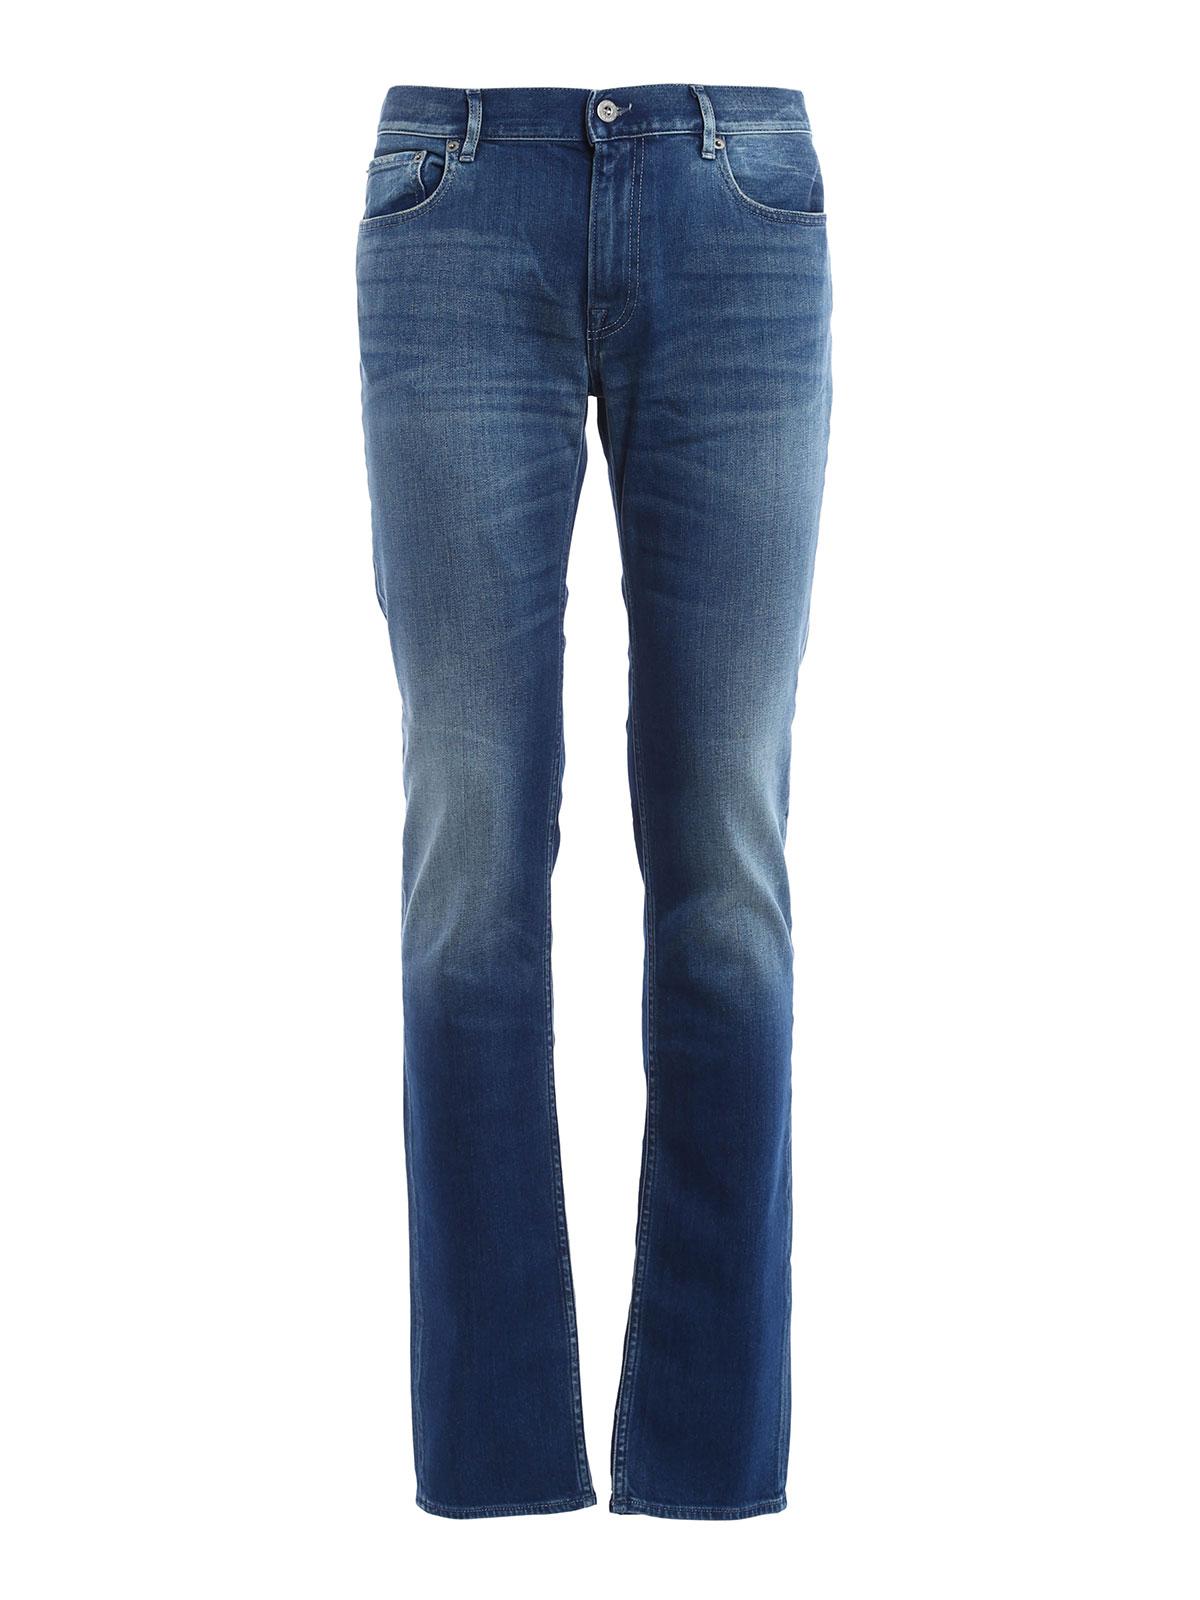 Skinny Distressed Jeans By Stone Island Skinny Jeans Ikrix